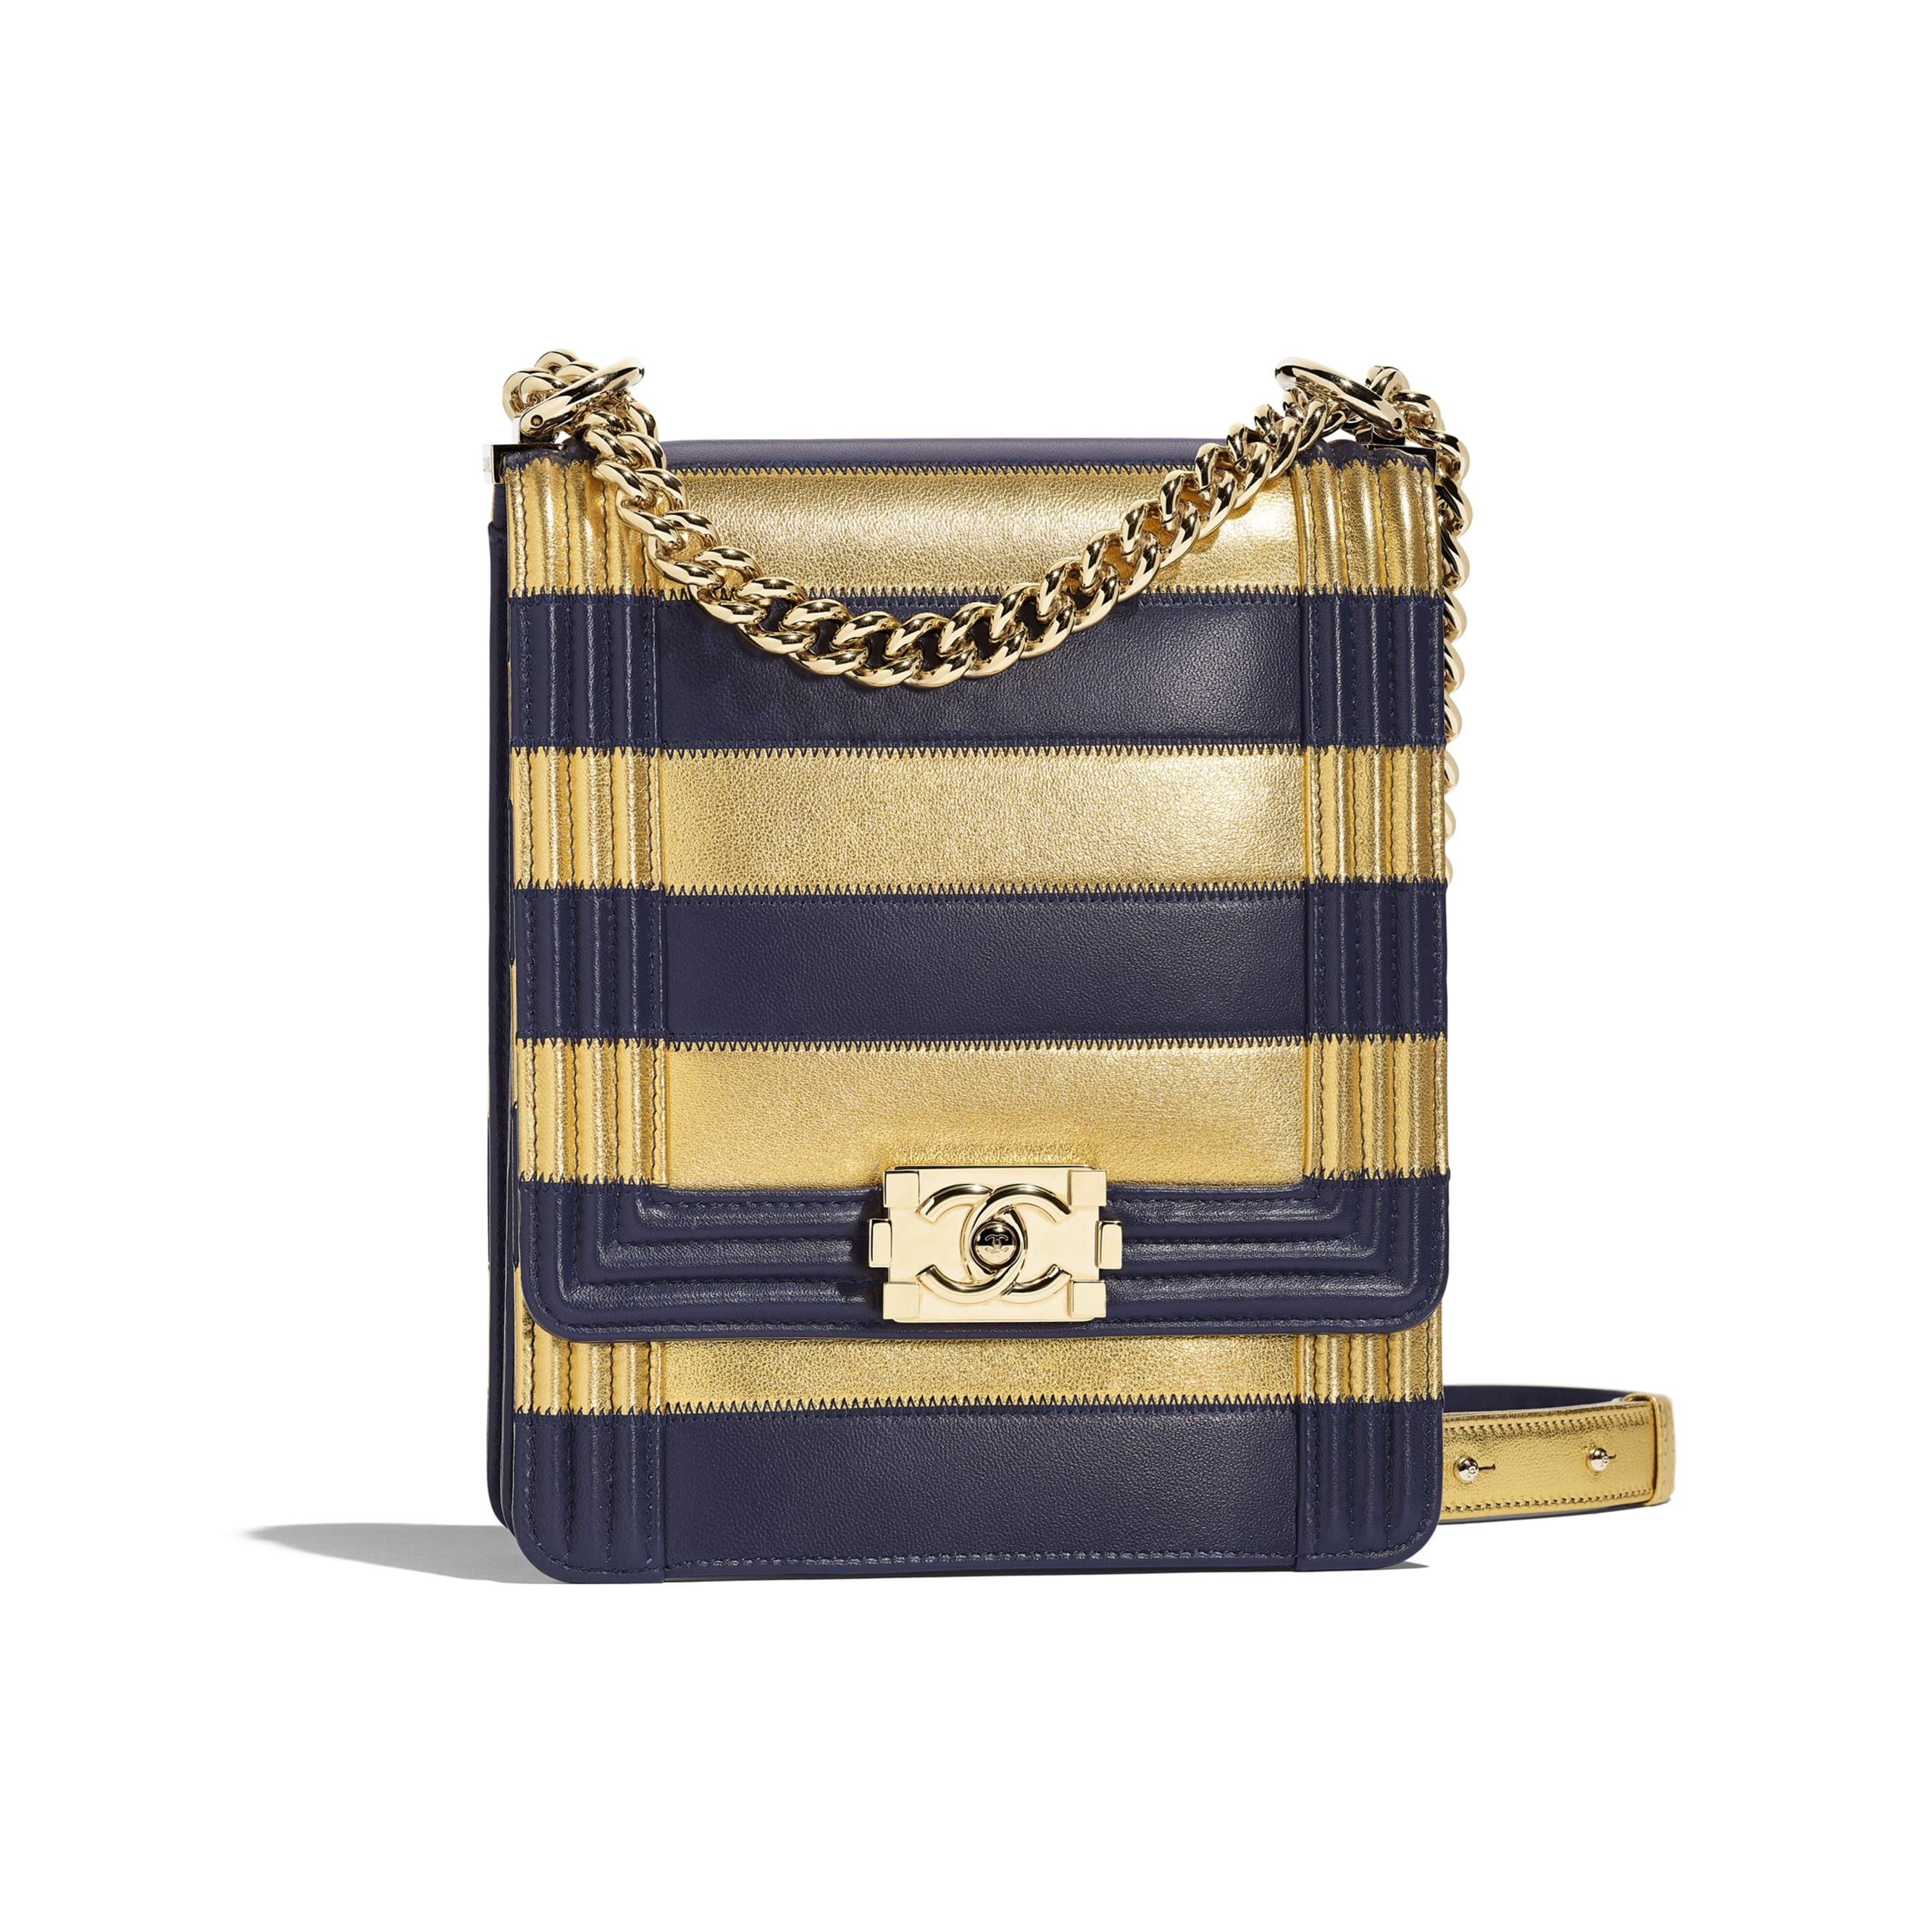 BOY CHANEL Handbag - Gold & Navy Blue - Lambskin, Calfskin & Gold-Tone Metal - Default view - see standard sized version